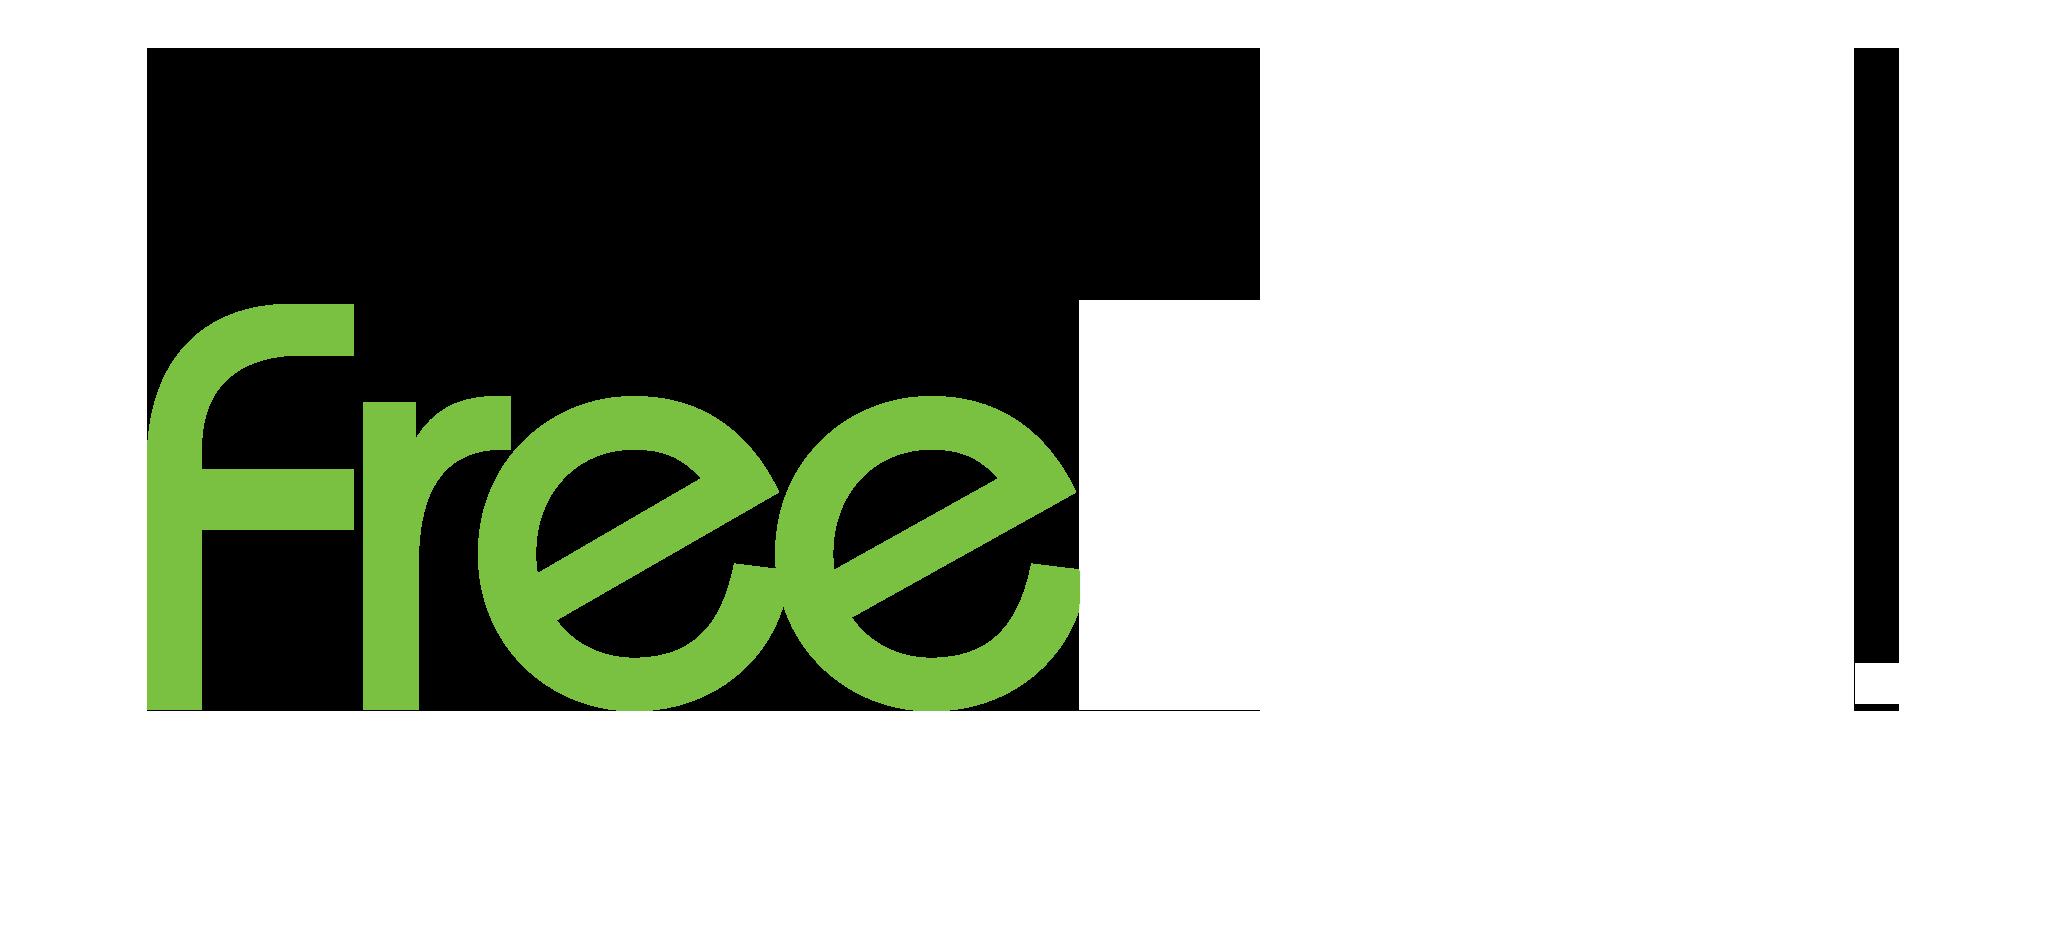 Link to freebirdchicken.com